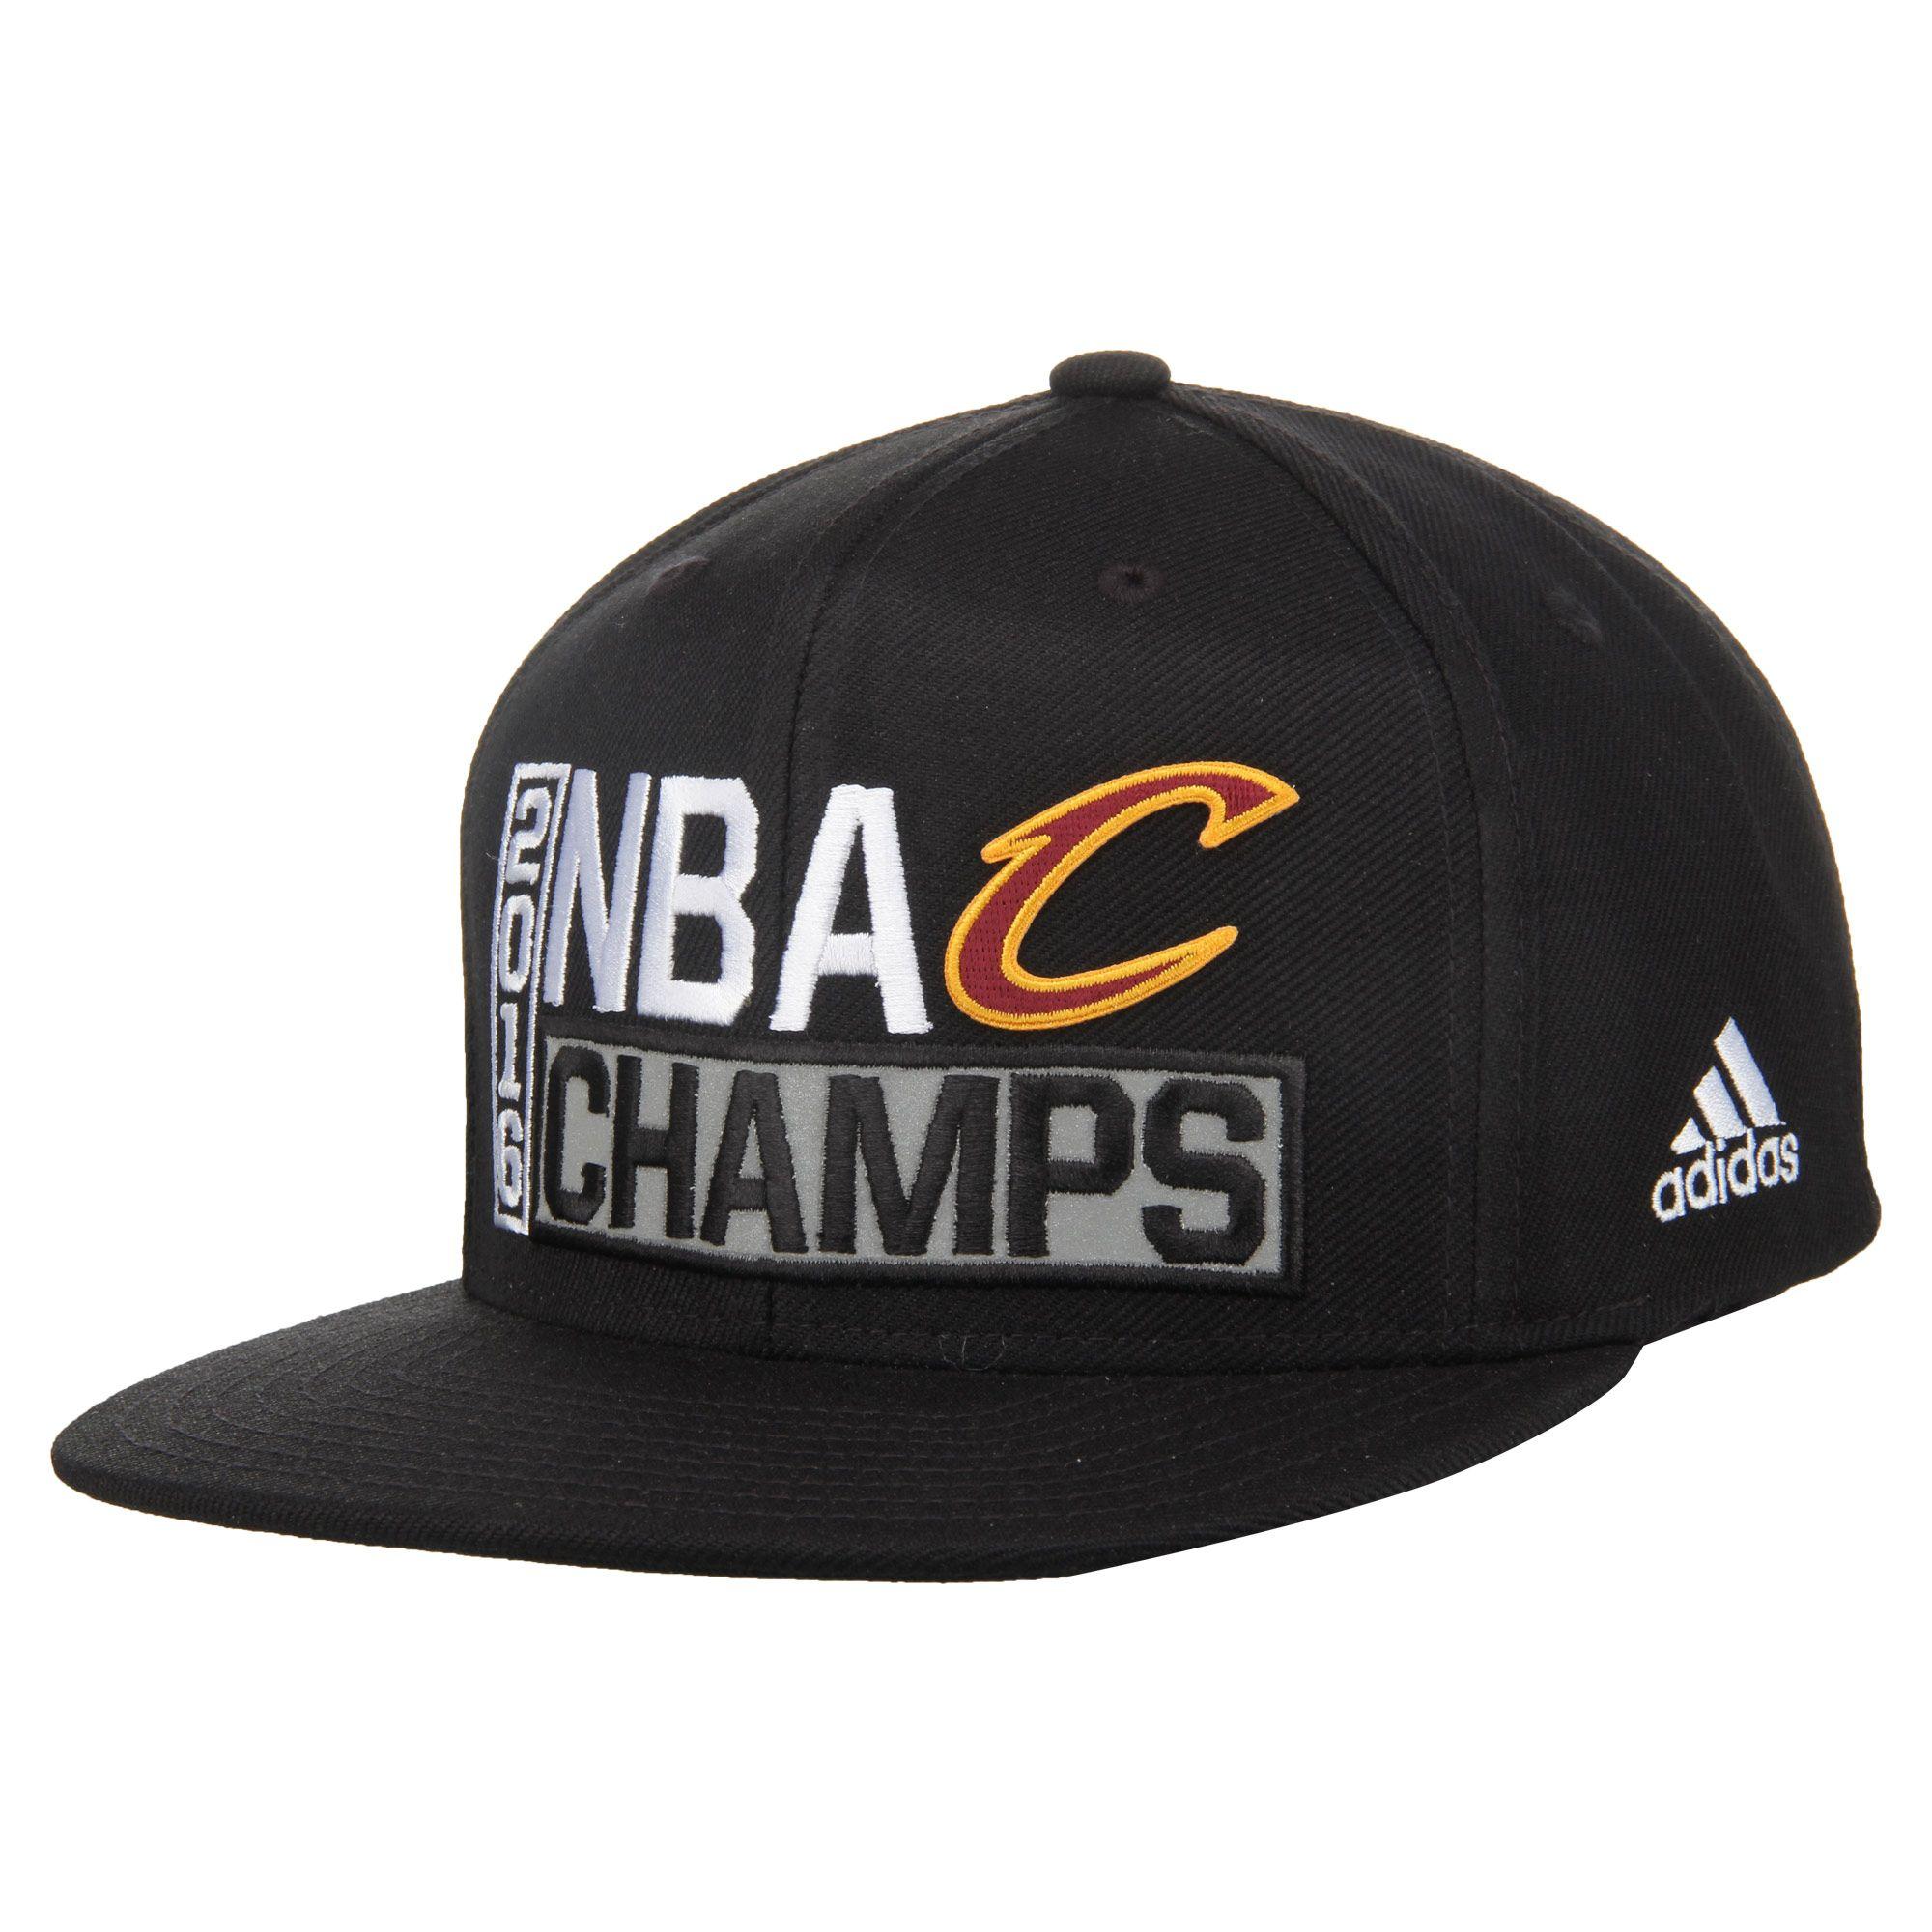 new style a3f9e 64fe3 Cleveland Cavaliers adidas 2016 NBA Finals Champions Locker Room Snapback  Adjustable Hat - Black